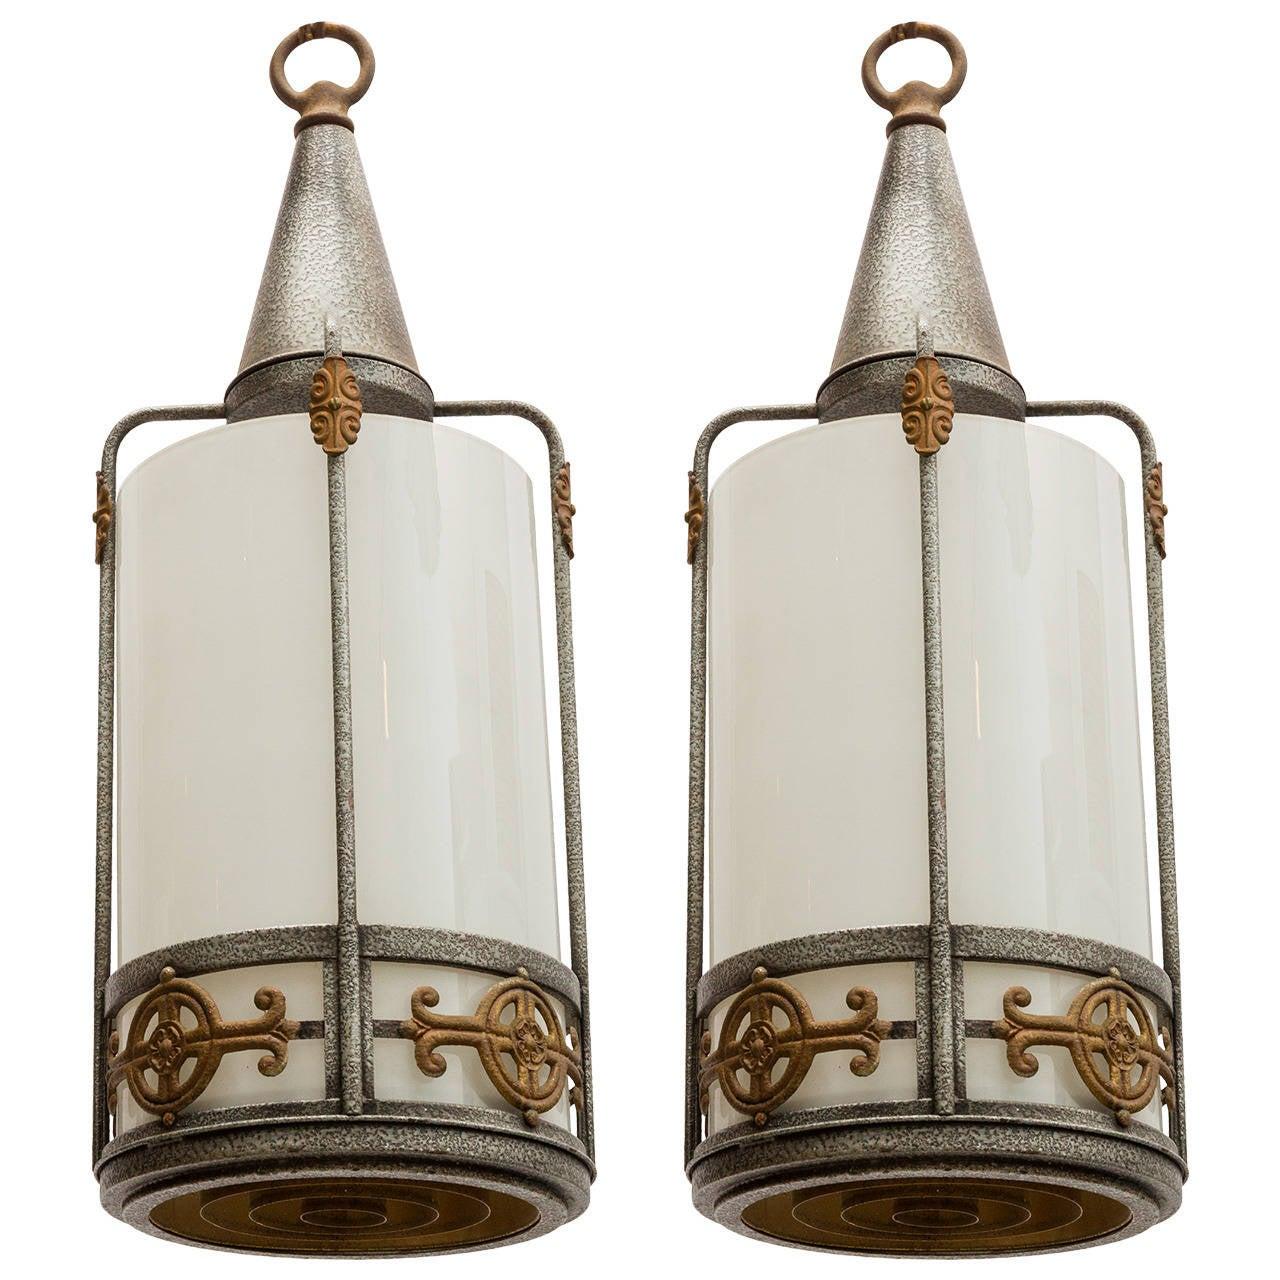 Pair of Church Lanterns